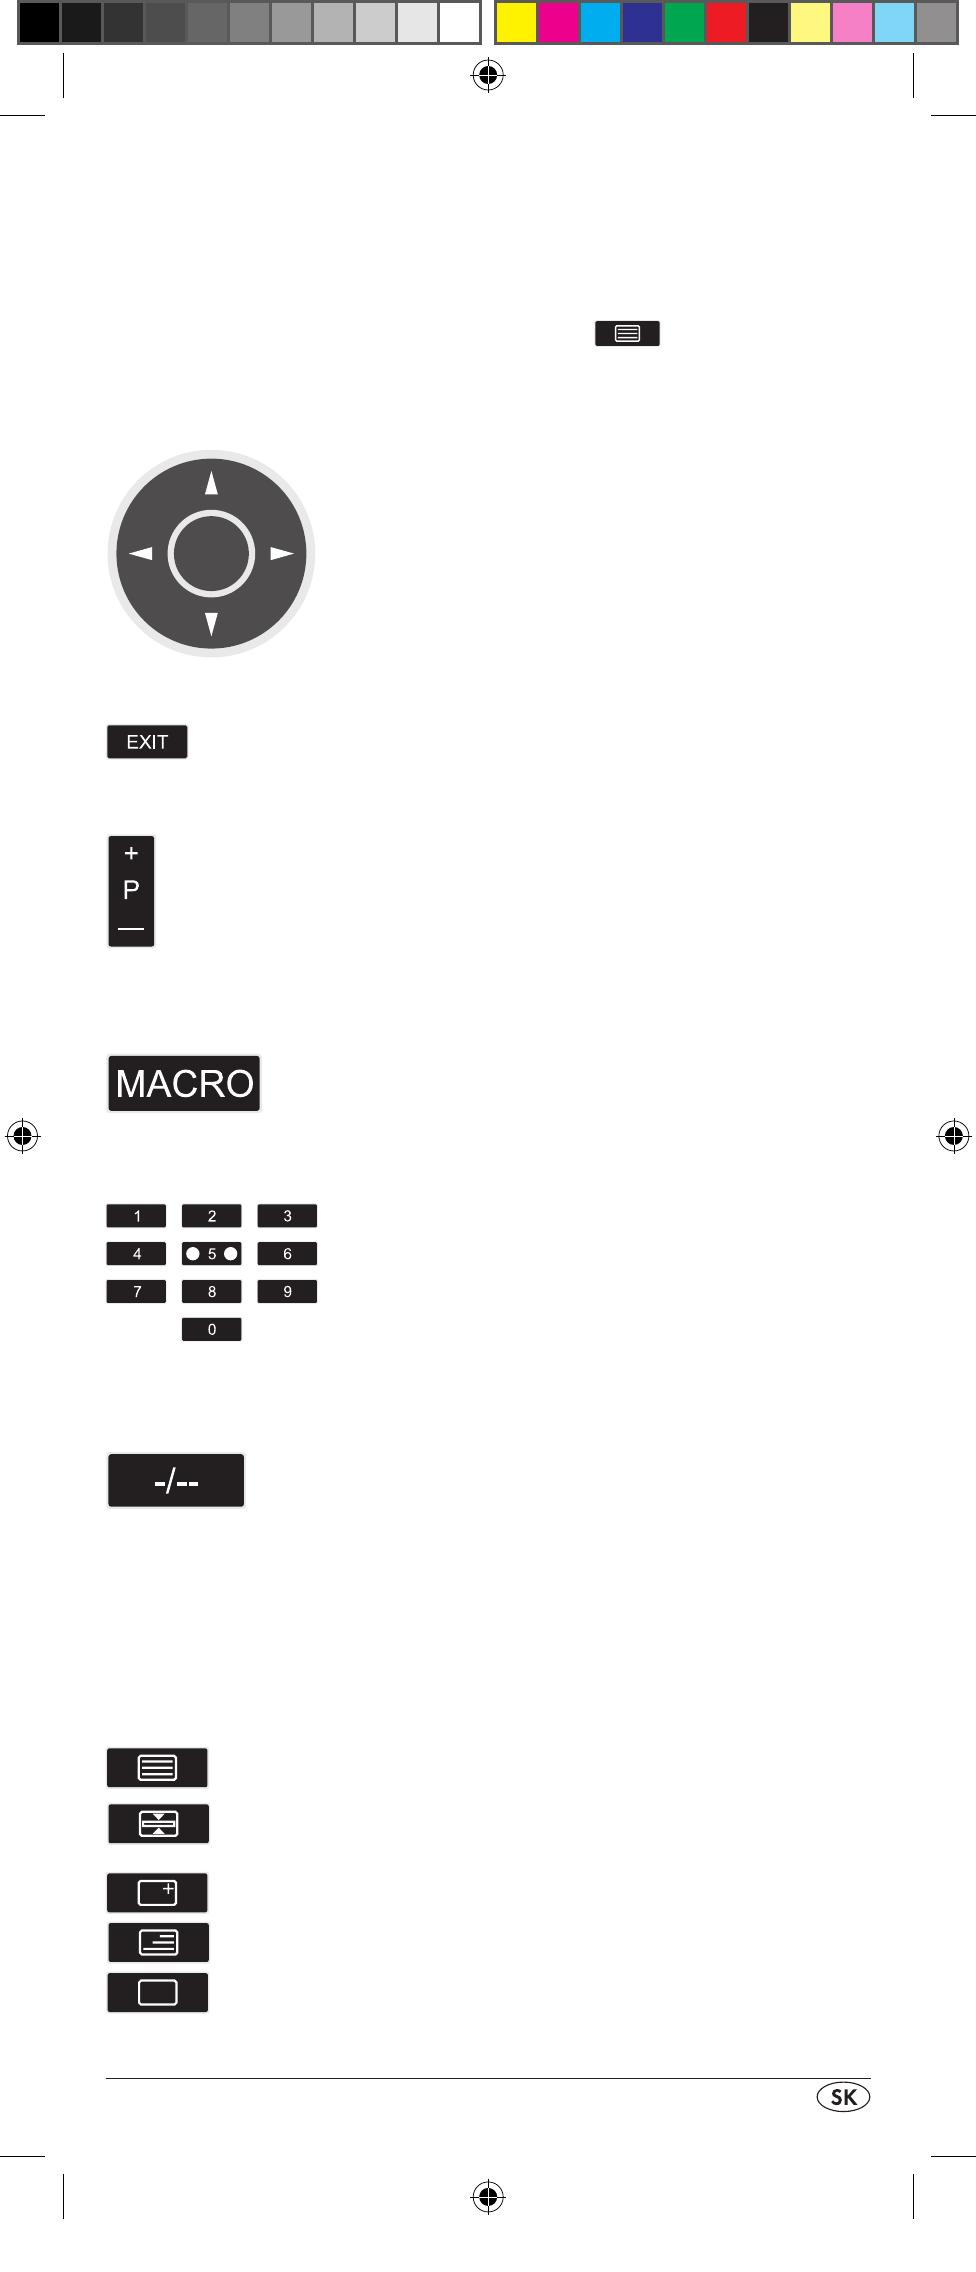 Silvercrest 10-IN-1 REMOTE CONTROL SFB 10.1 B2 User Manual